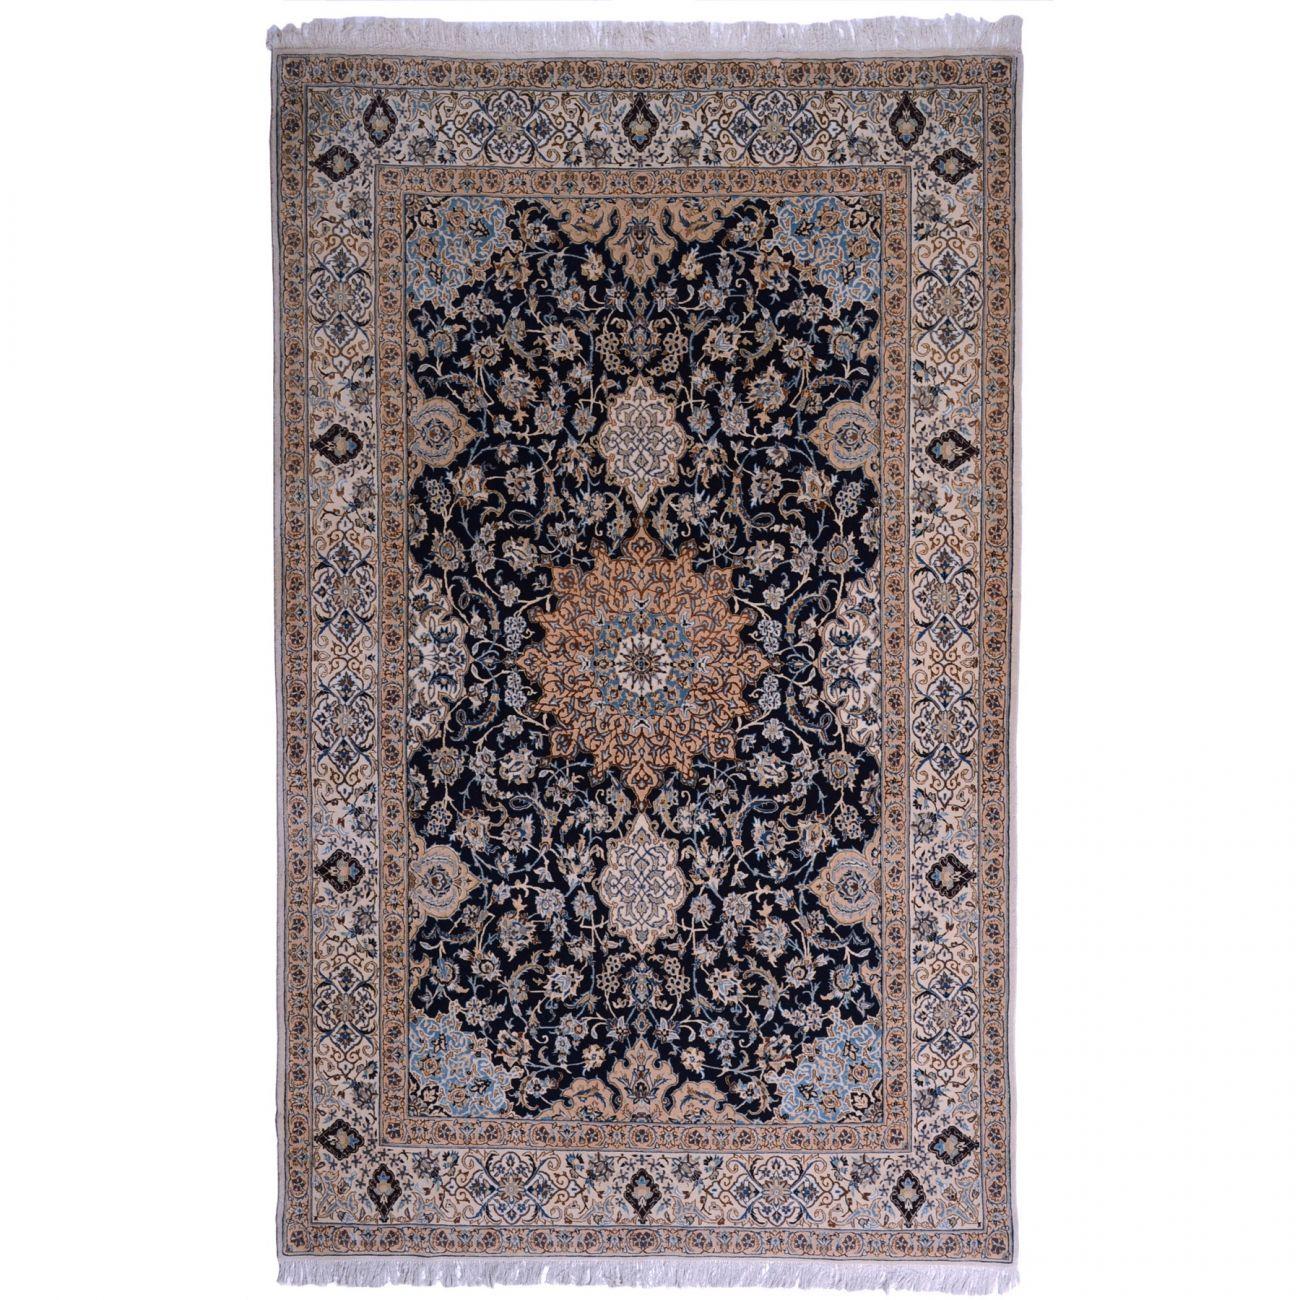 Nain 6la 270x165cm Persian Rug